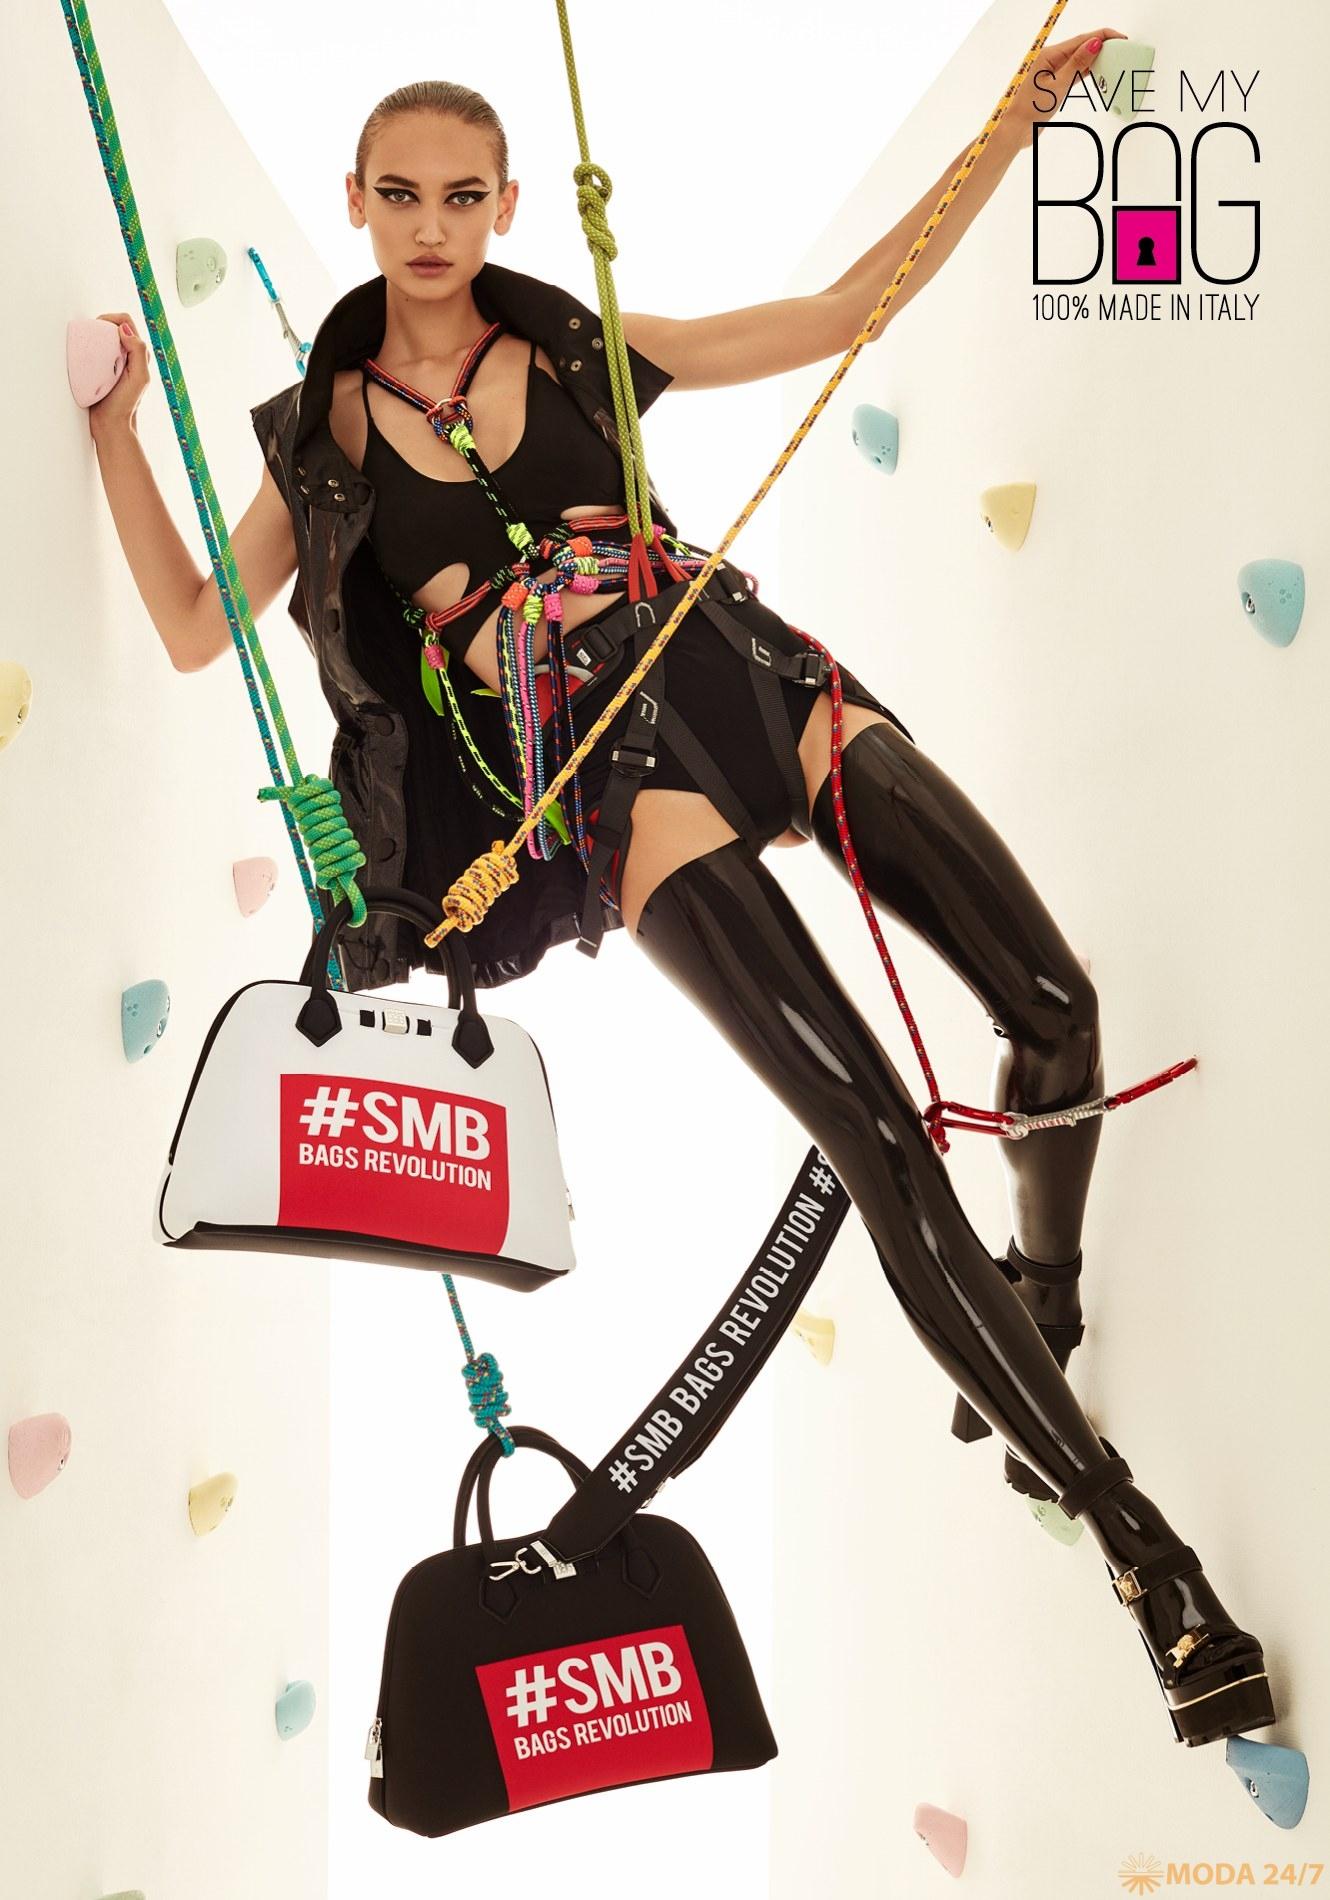 Сумки PRINCESS MIDI Save My Bag с хештегом #SMB. Save My Bag AW-2018/19 (осень-зима 2018/19)